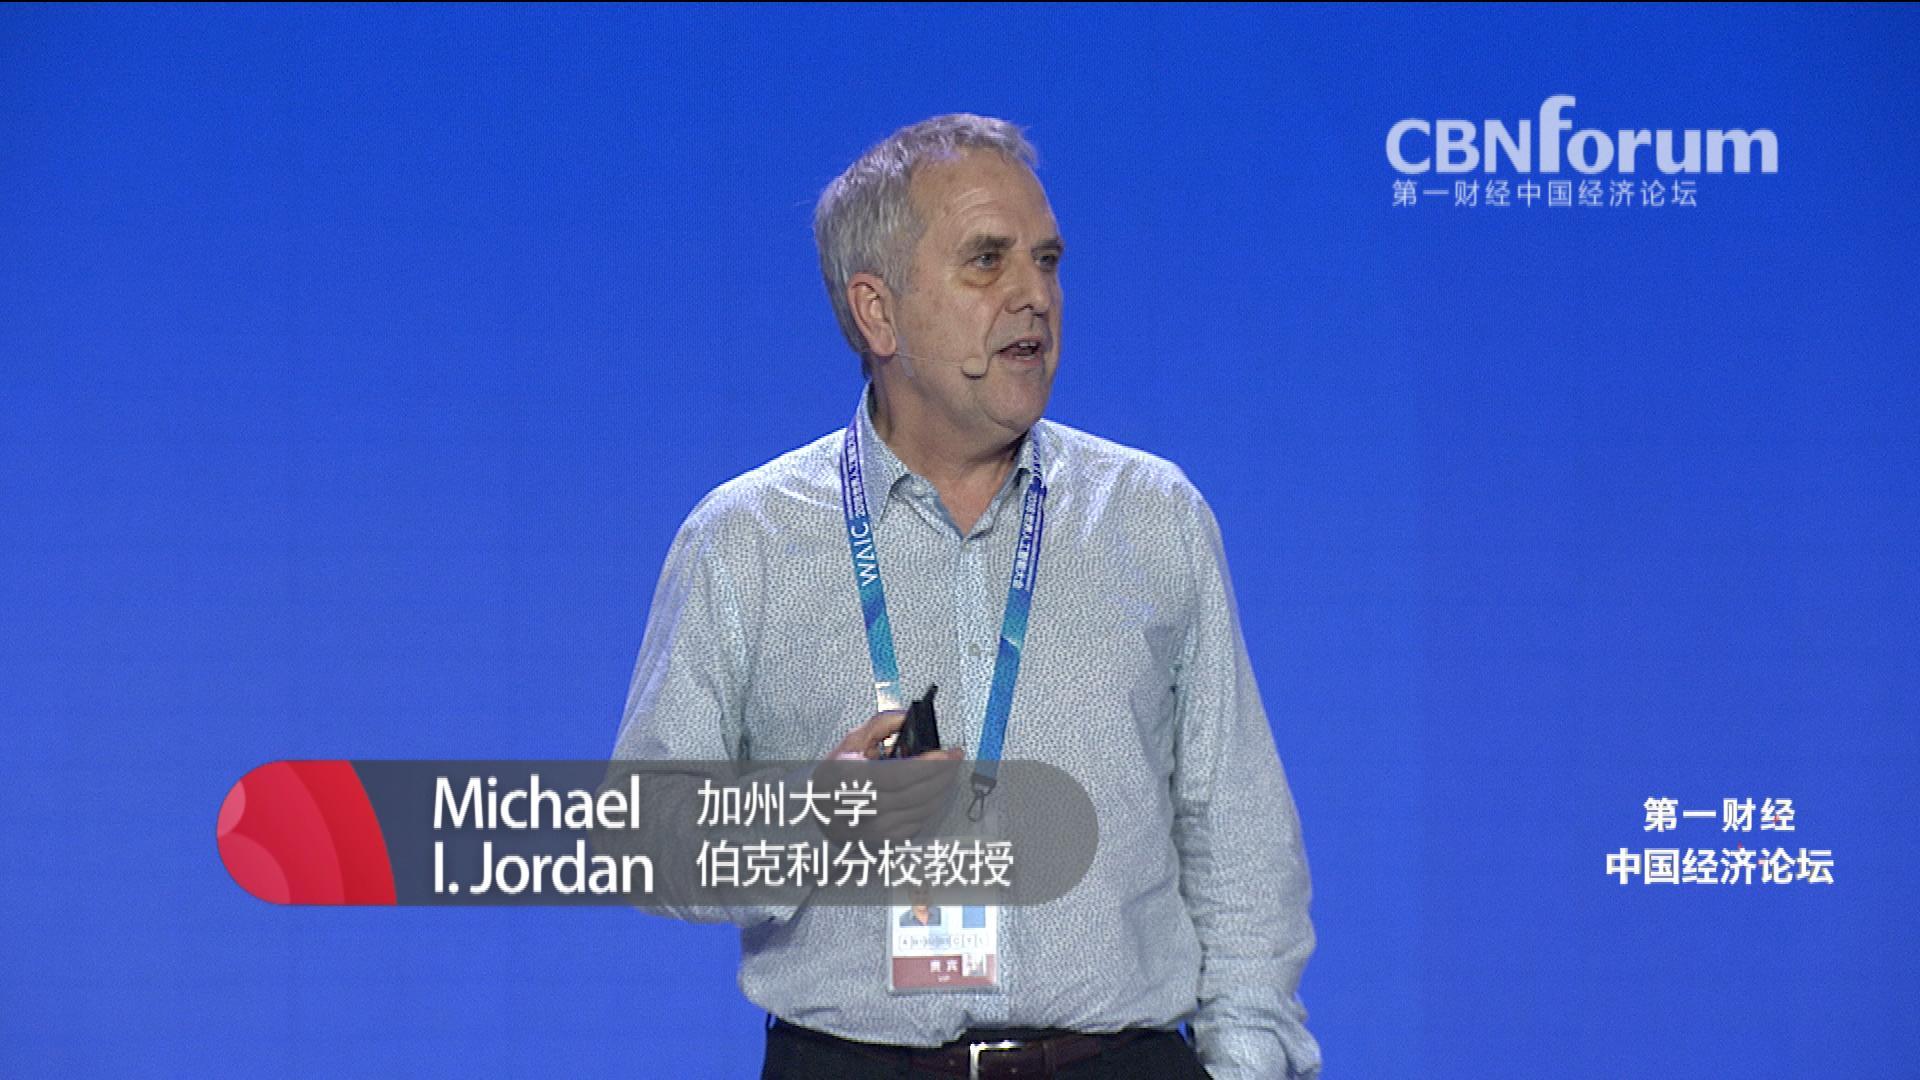 Michael I. Jordan 加州大学伯克利分校教授